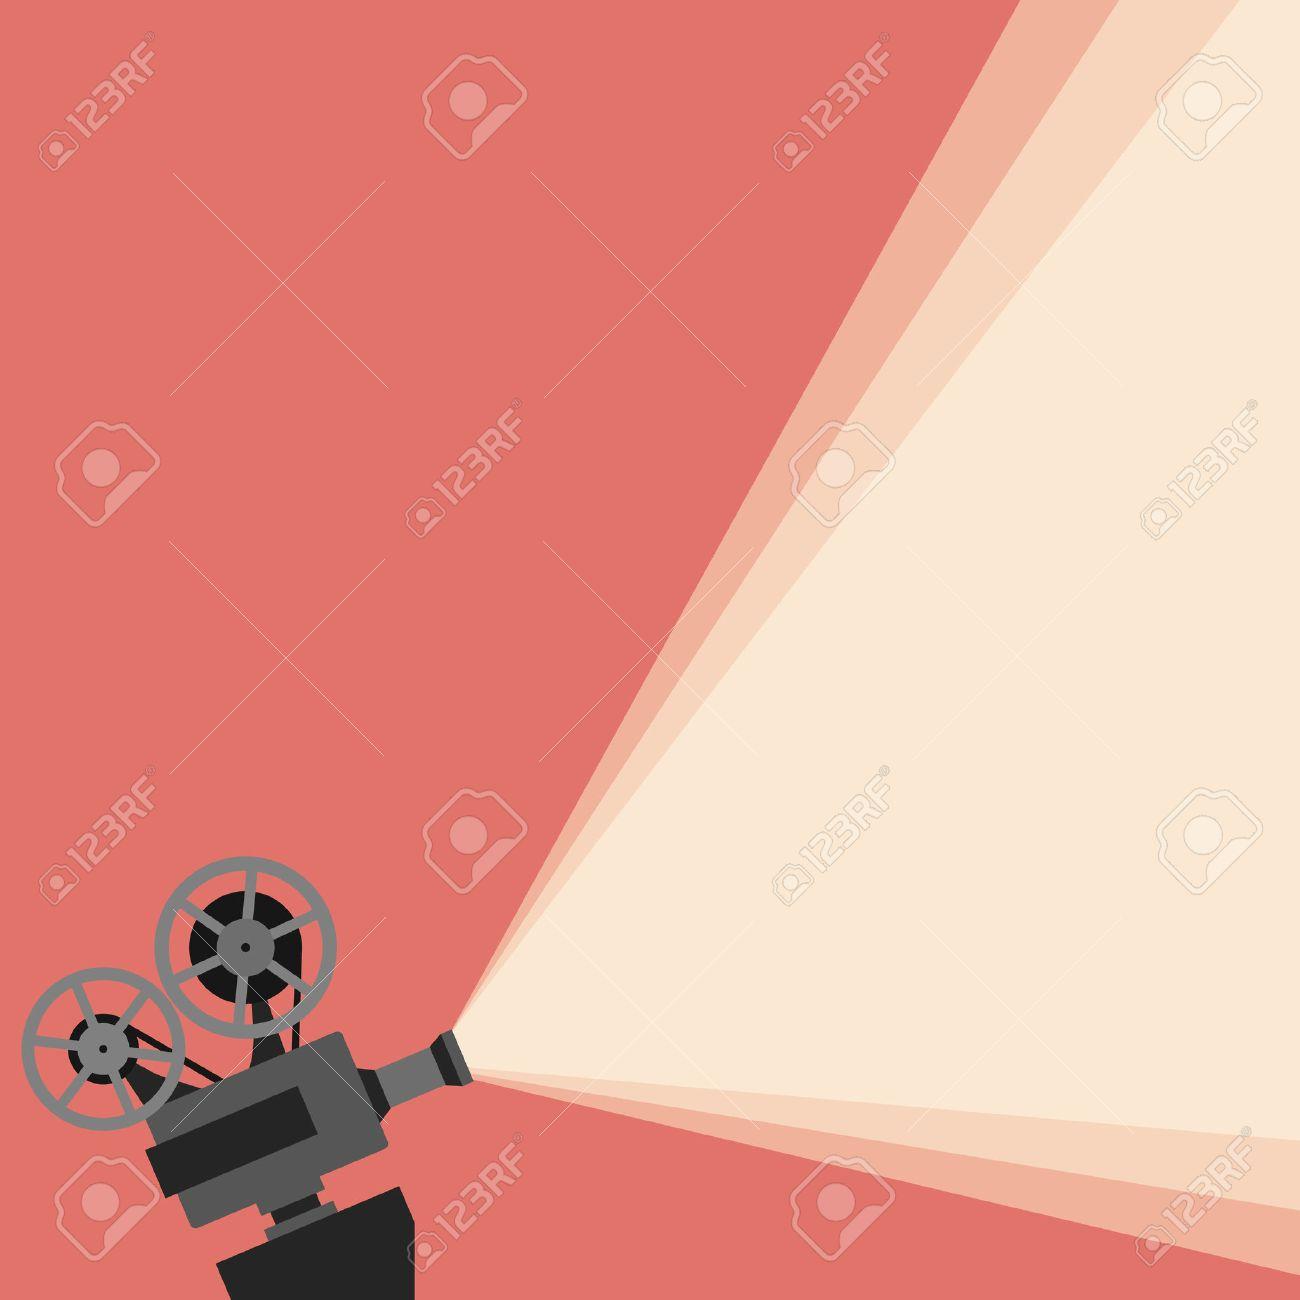 Movie projector vector illustration. Movie projector vector concept. Movie projector background cinema illustration. Movie projector vintage poster. Vector movie projector background for your design. - 55699748